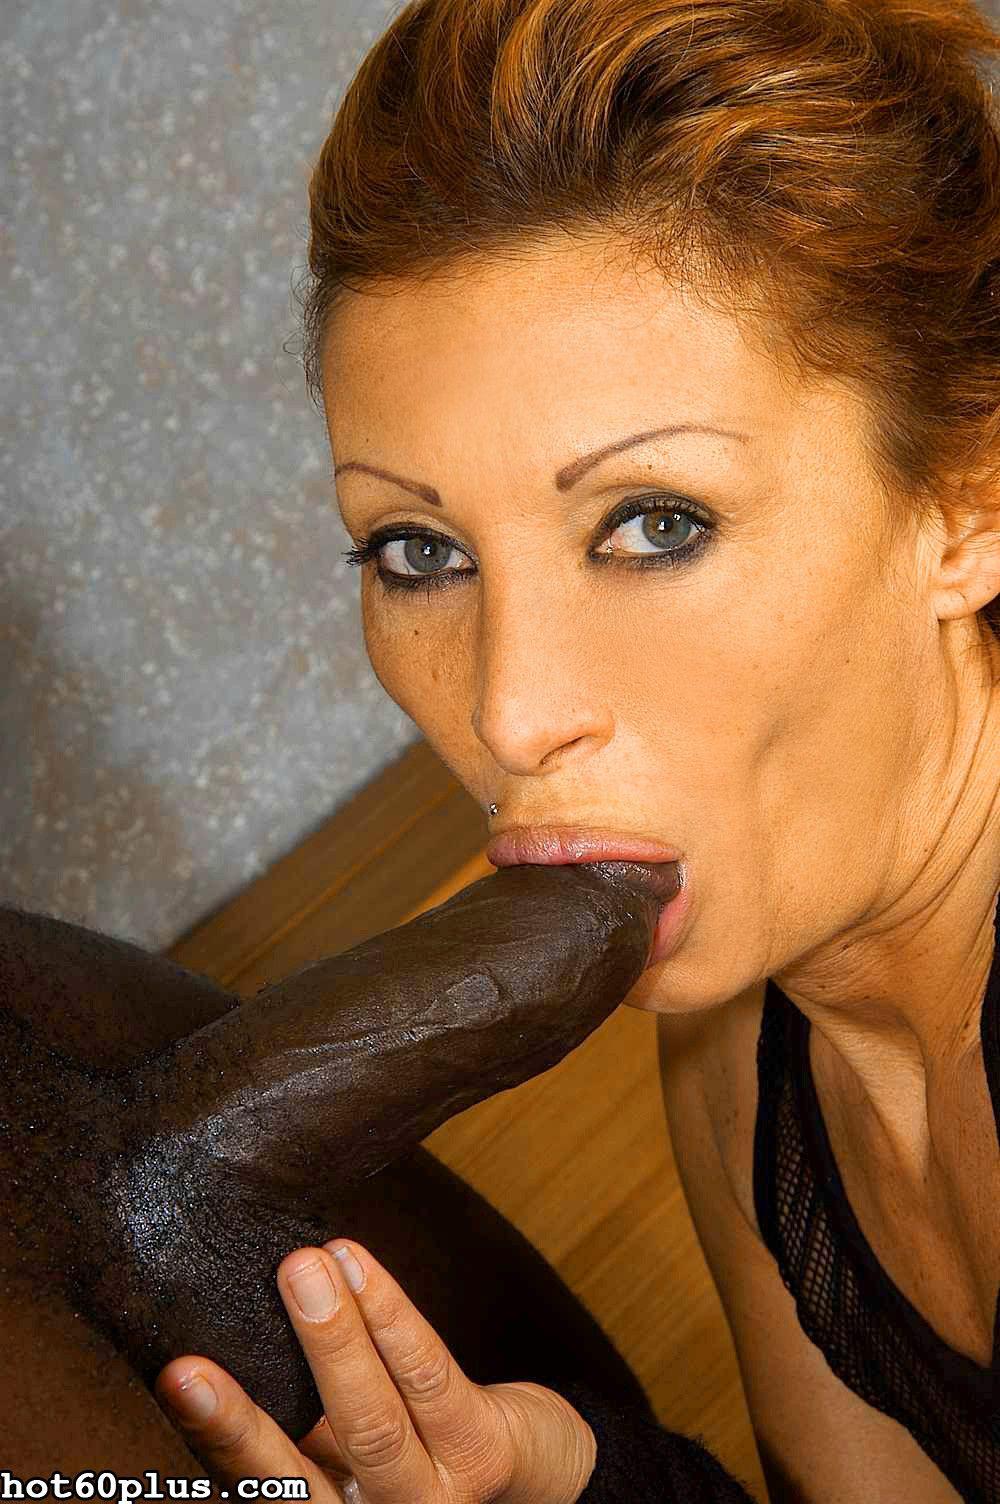 Old woman gets huge black dick deeep into sloppy possy